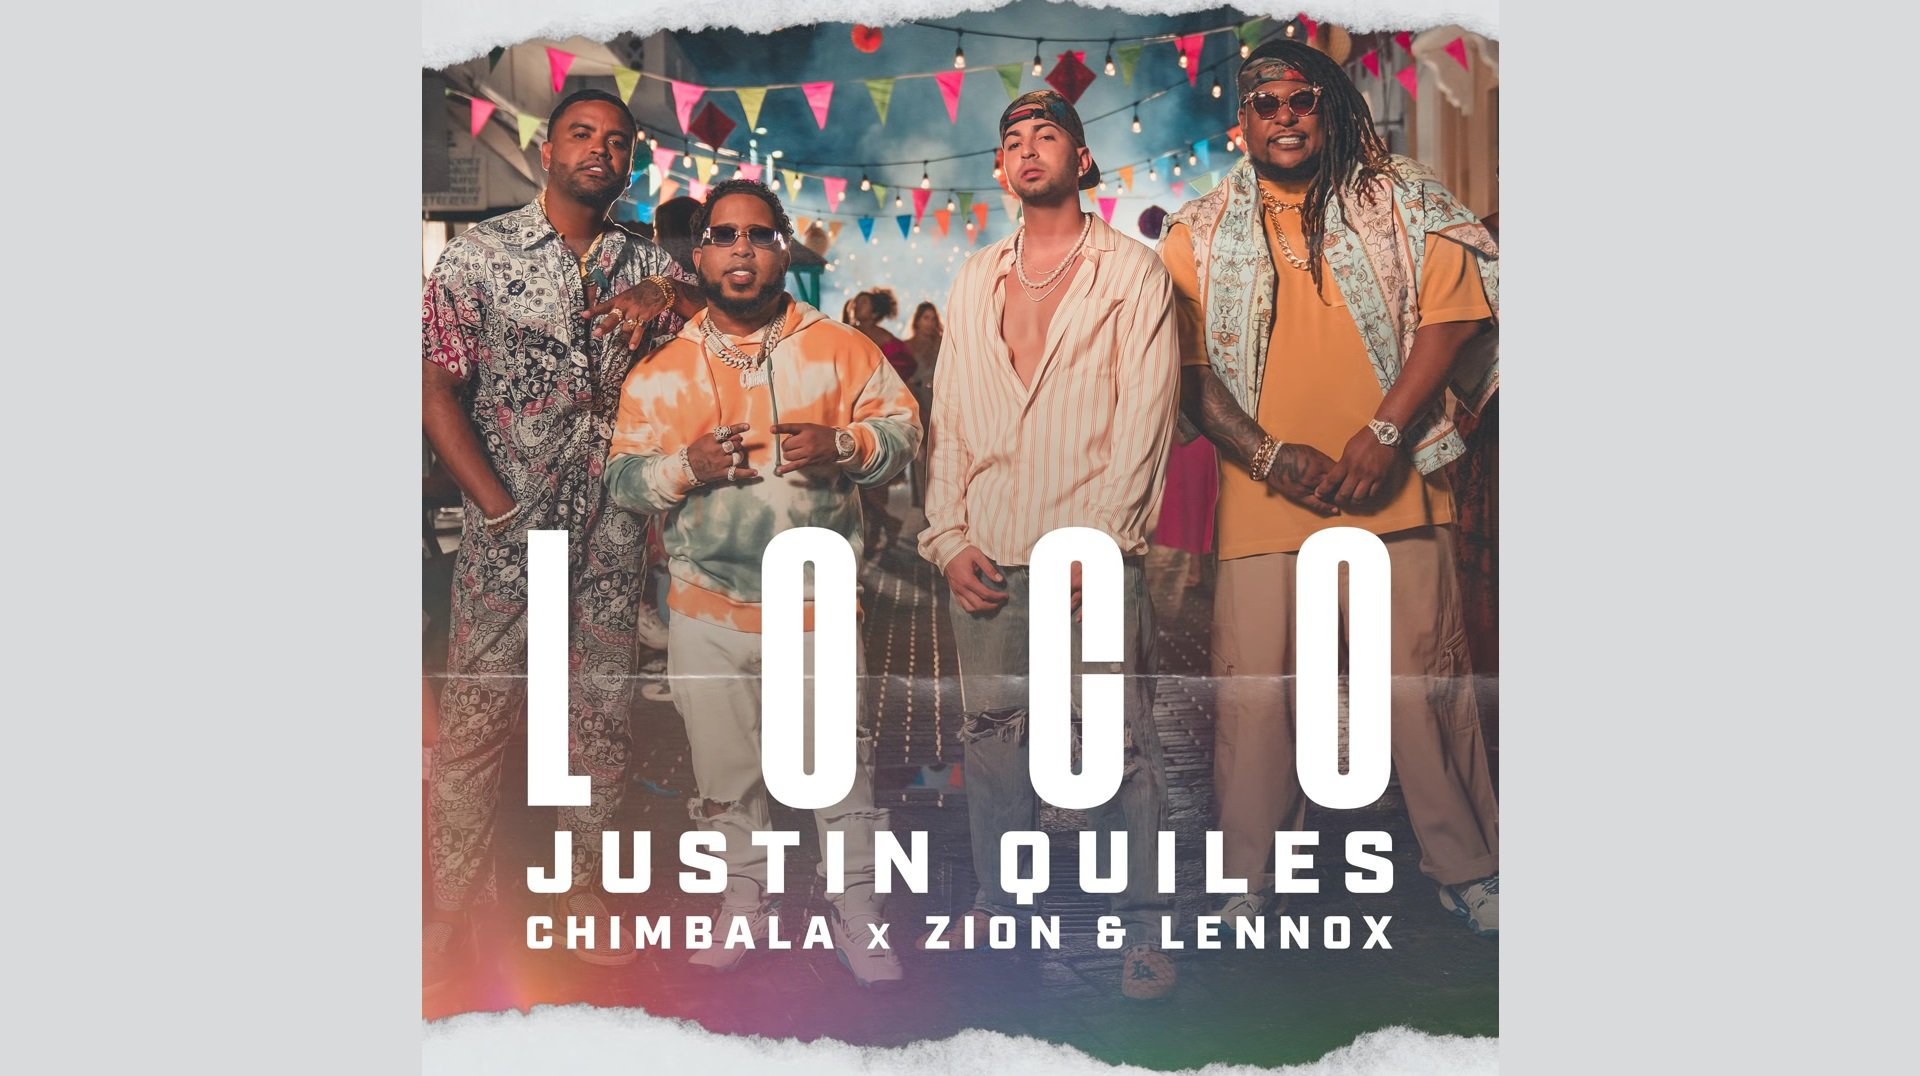 Justin Quiles x Chimbala x Zion Lennox Loco